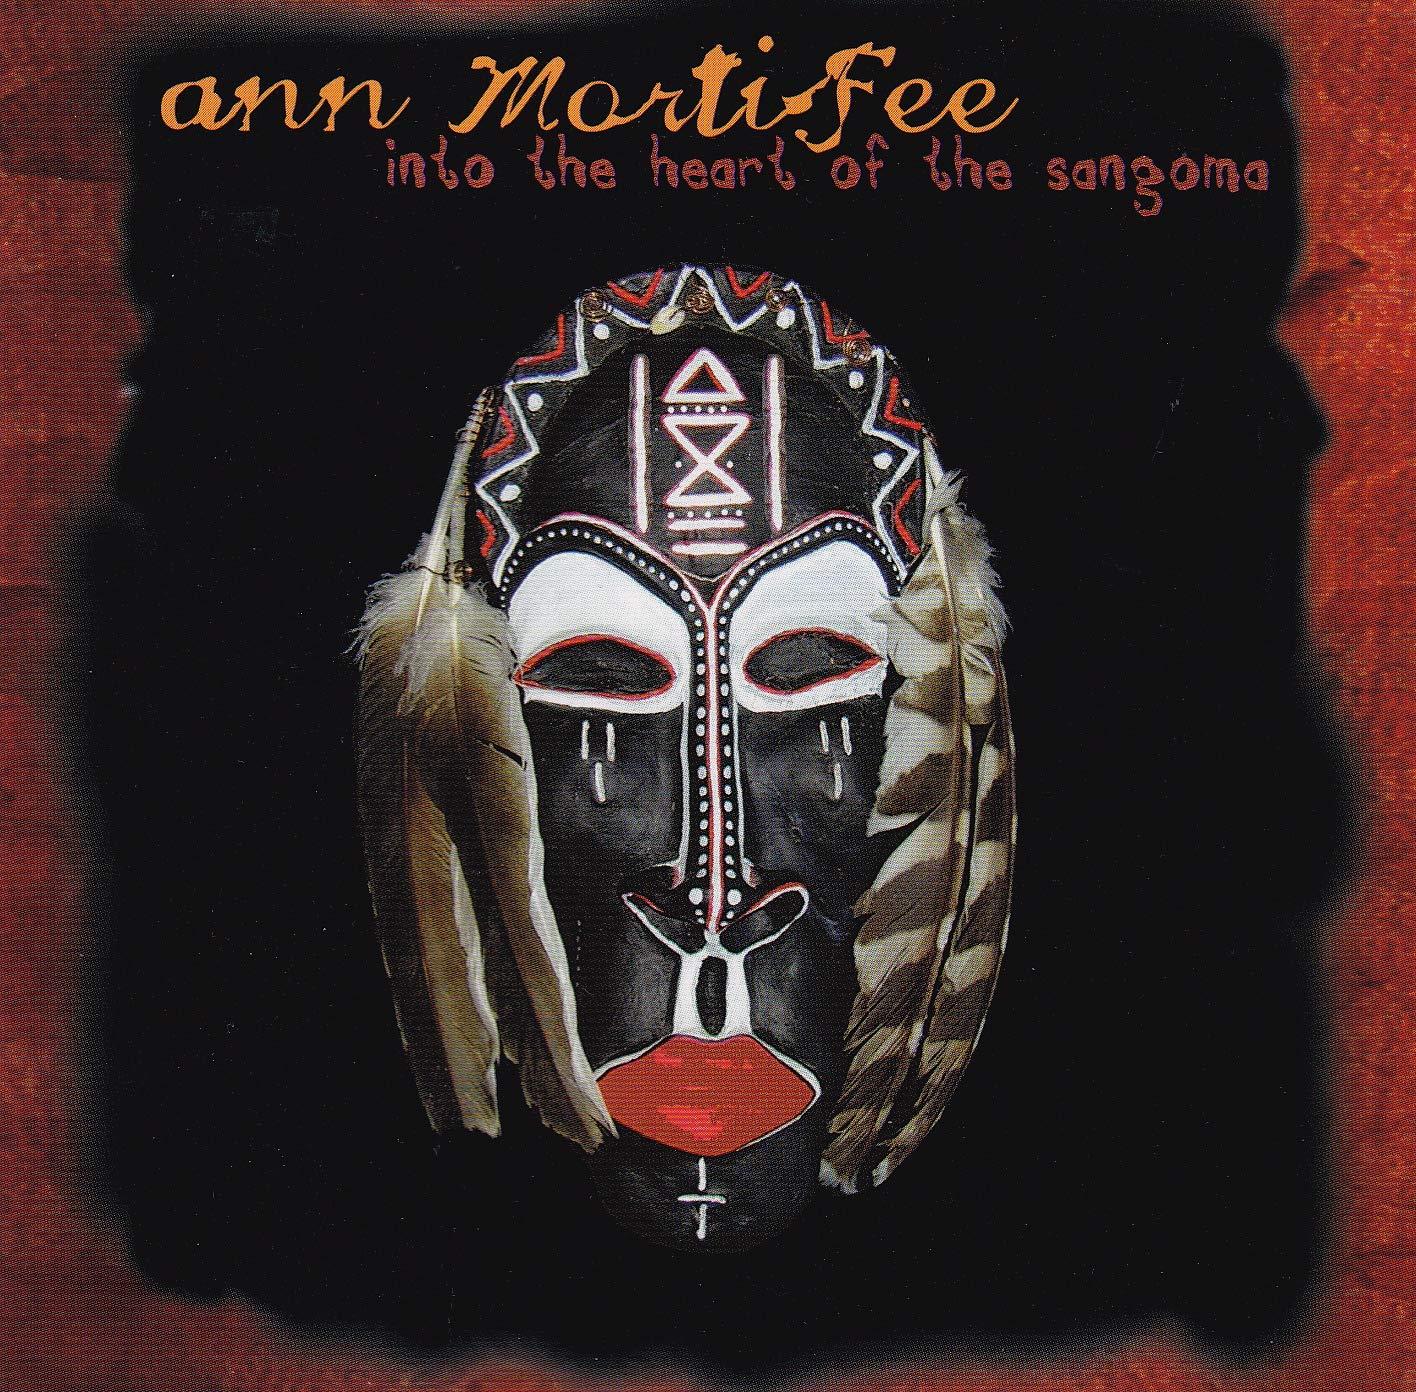 Ann Mortifee - Into the Heart of the Sangoma - Amazon com Music